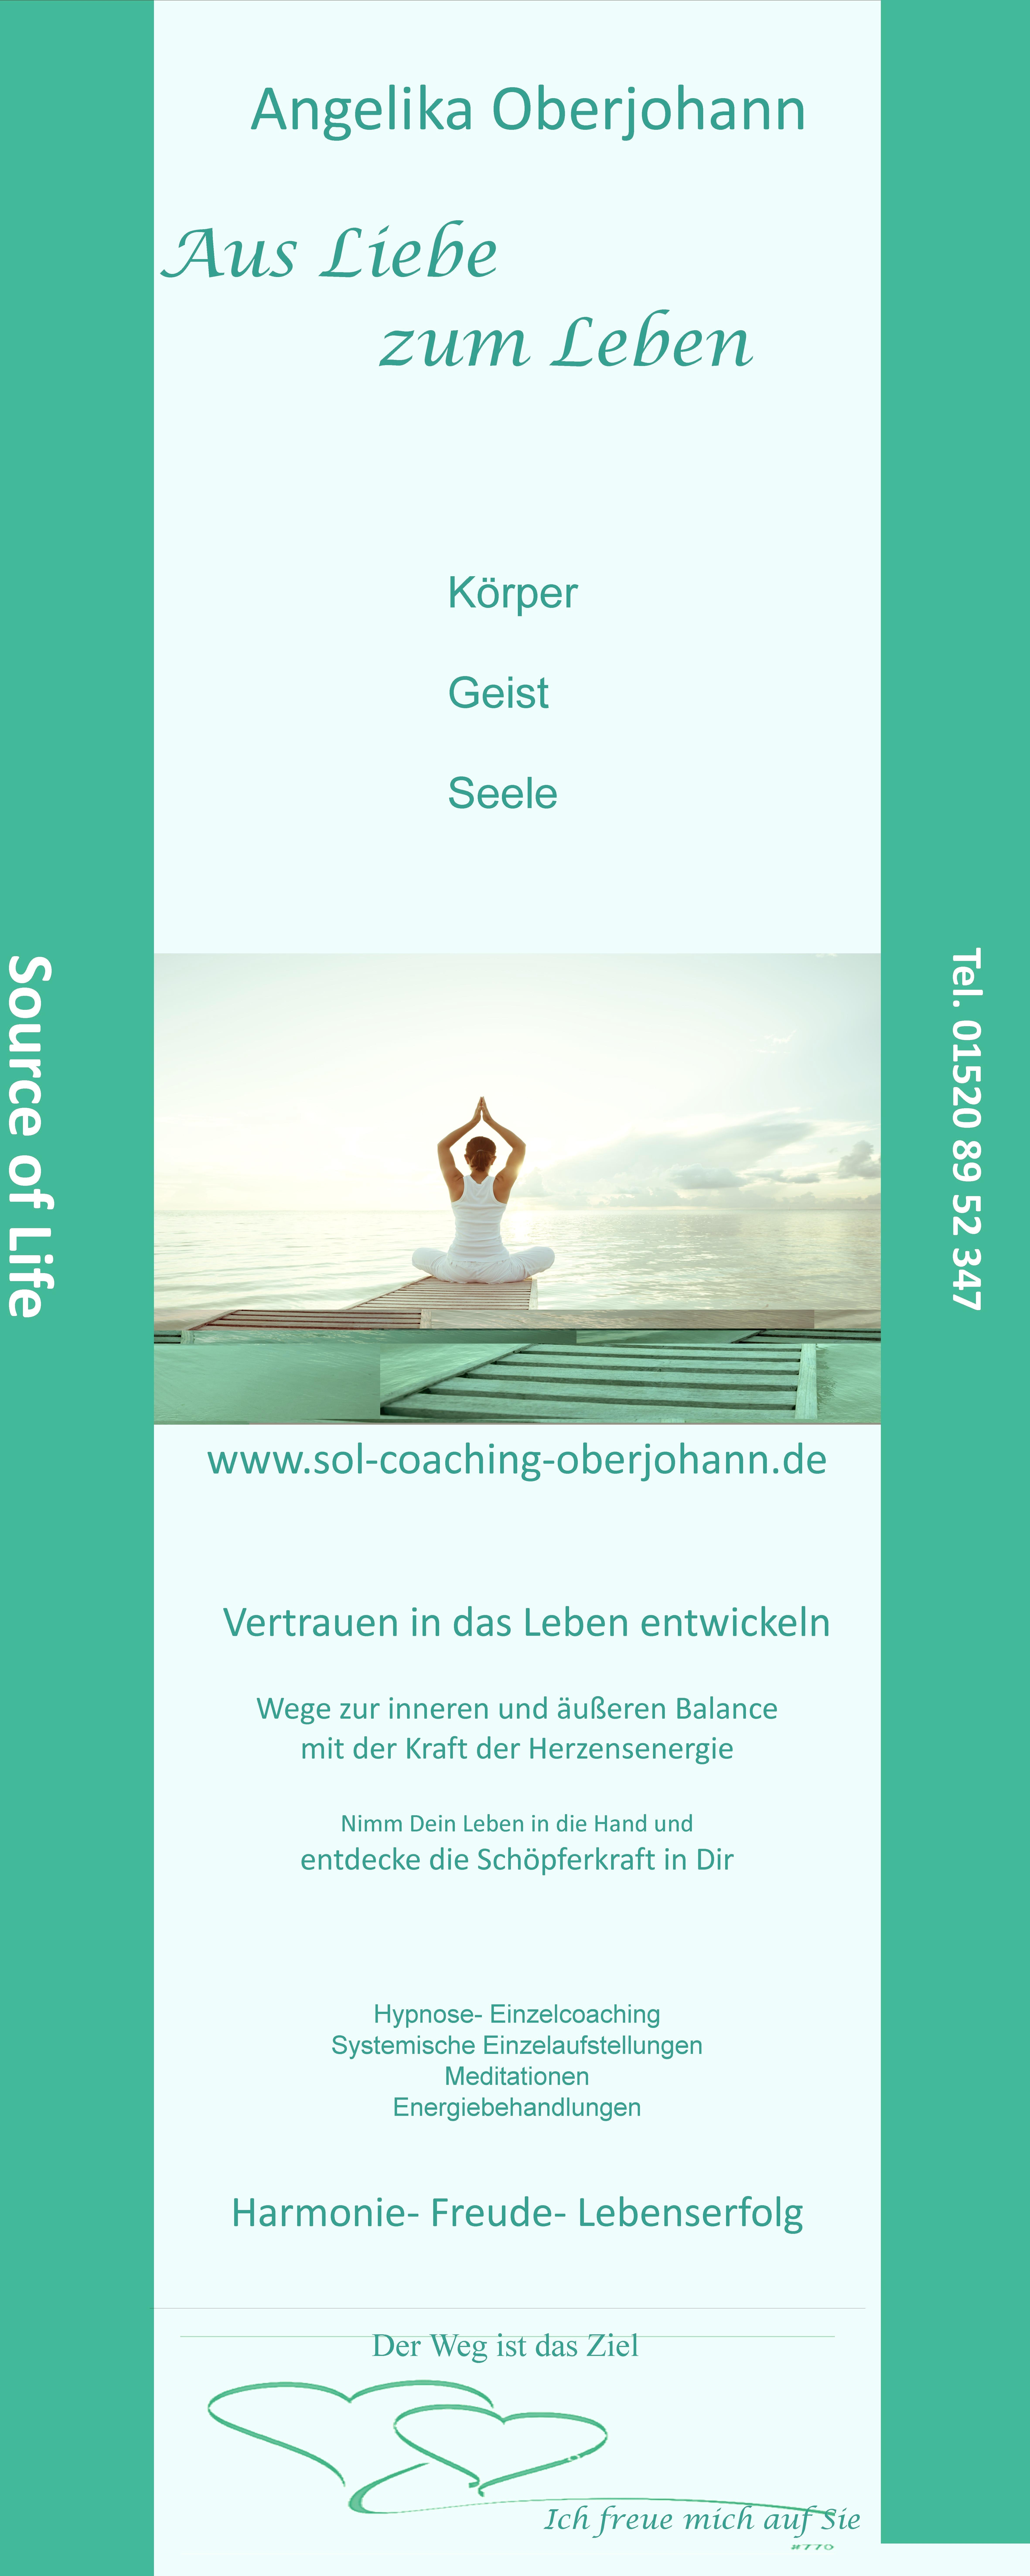 Angelika Oberjohann - Source of Life-